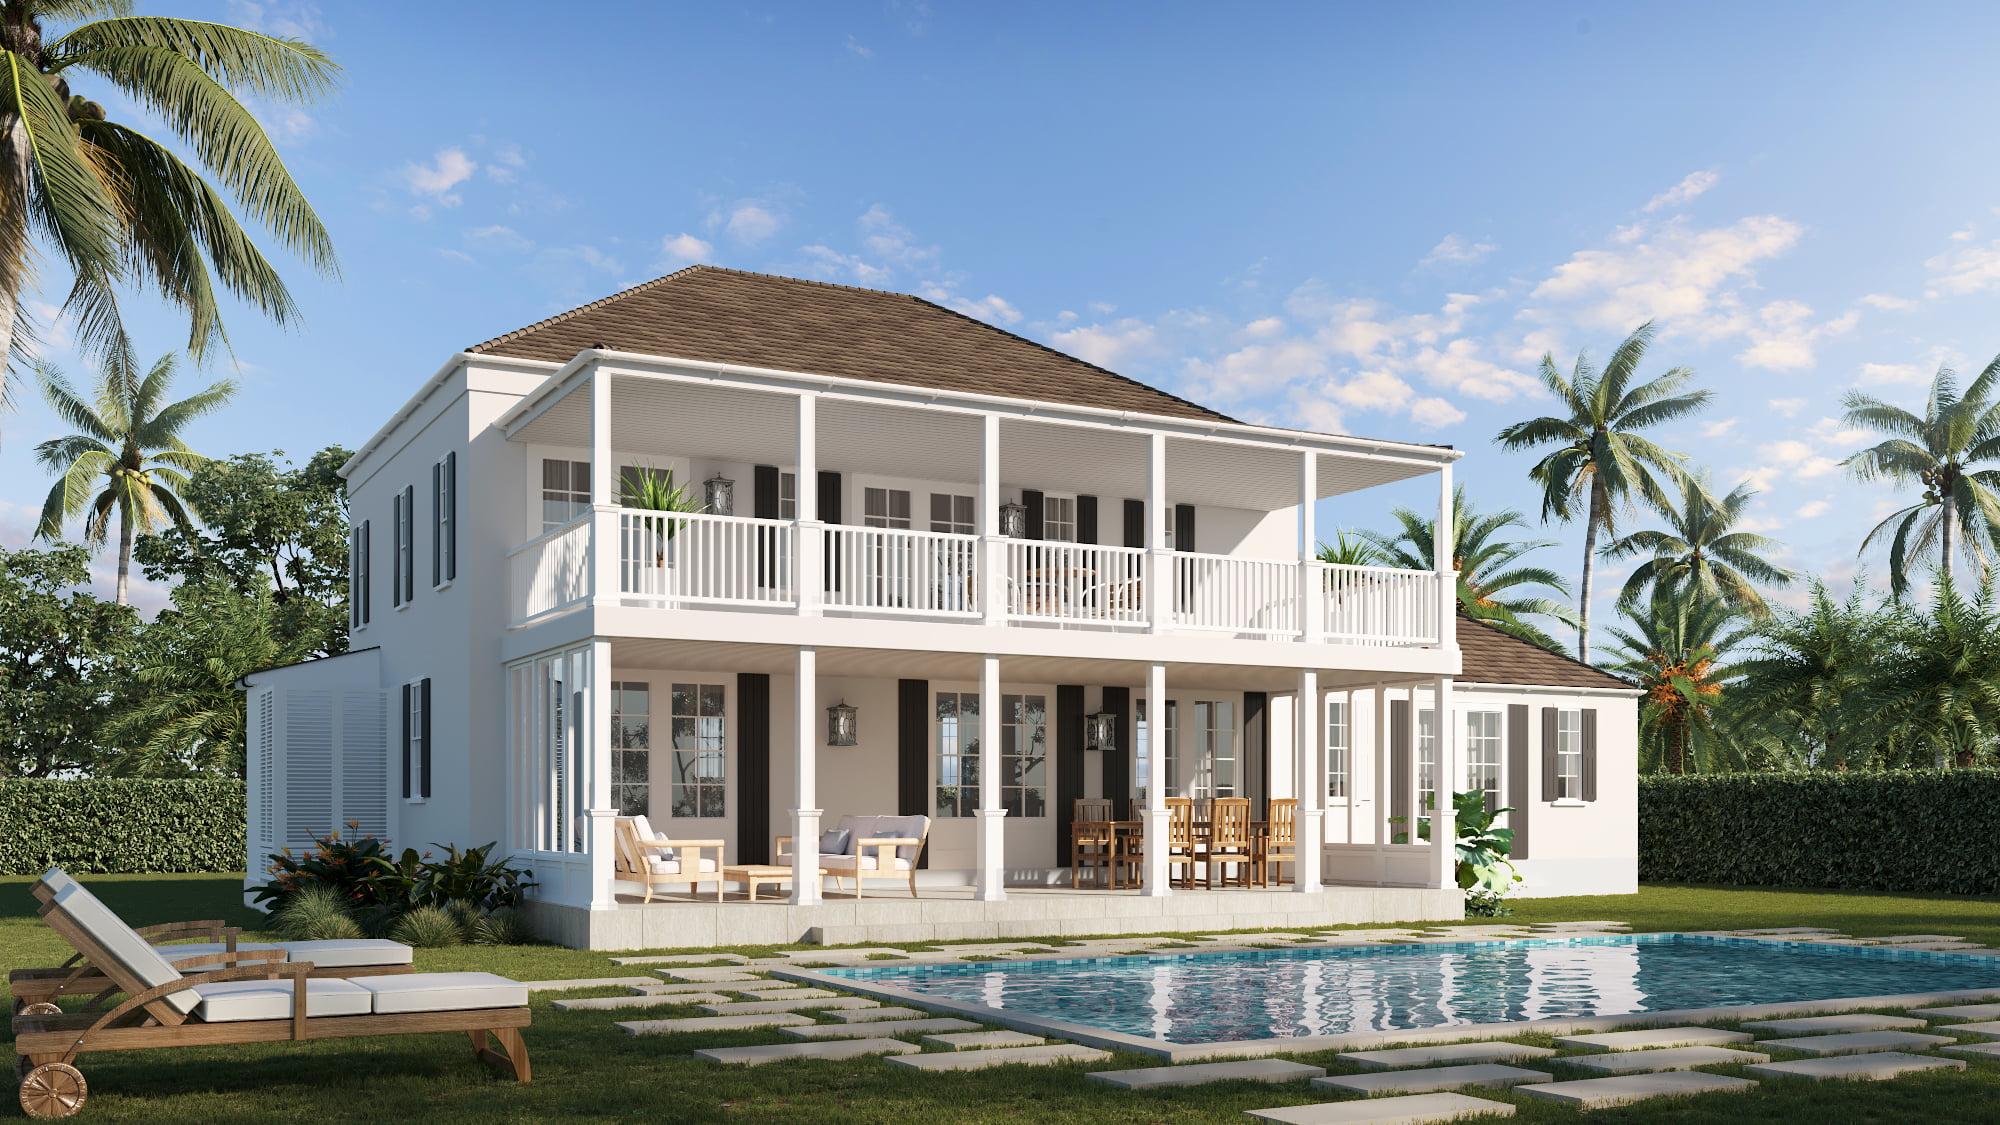 Sothebys Bahamas rear - 3D RENDERINGS